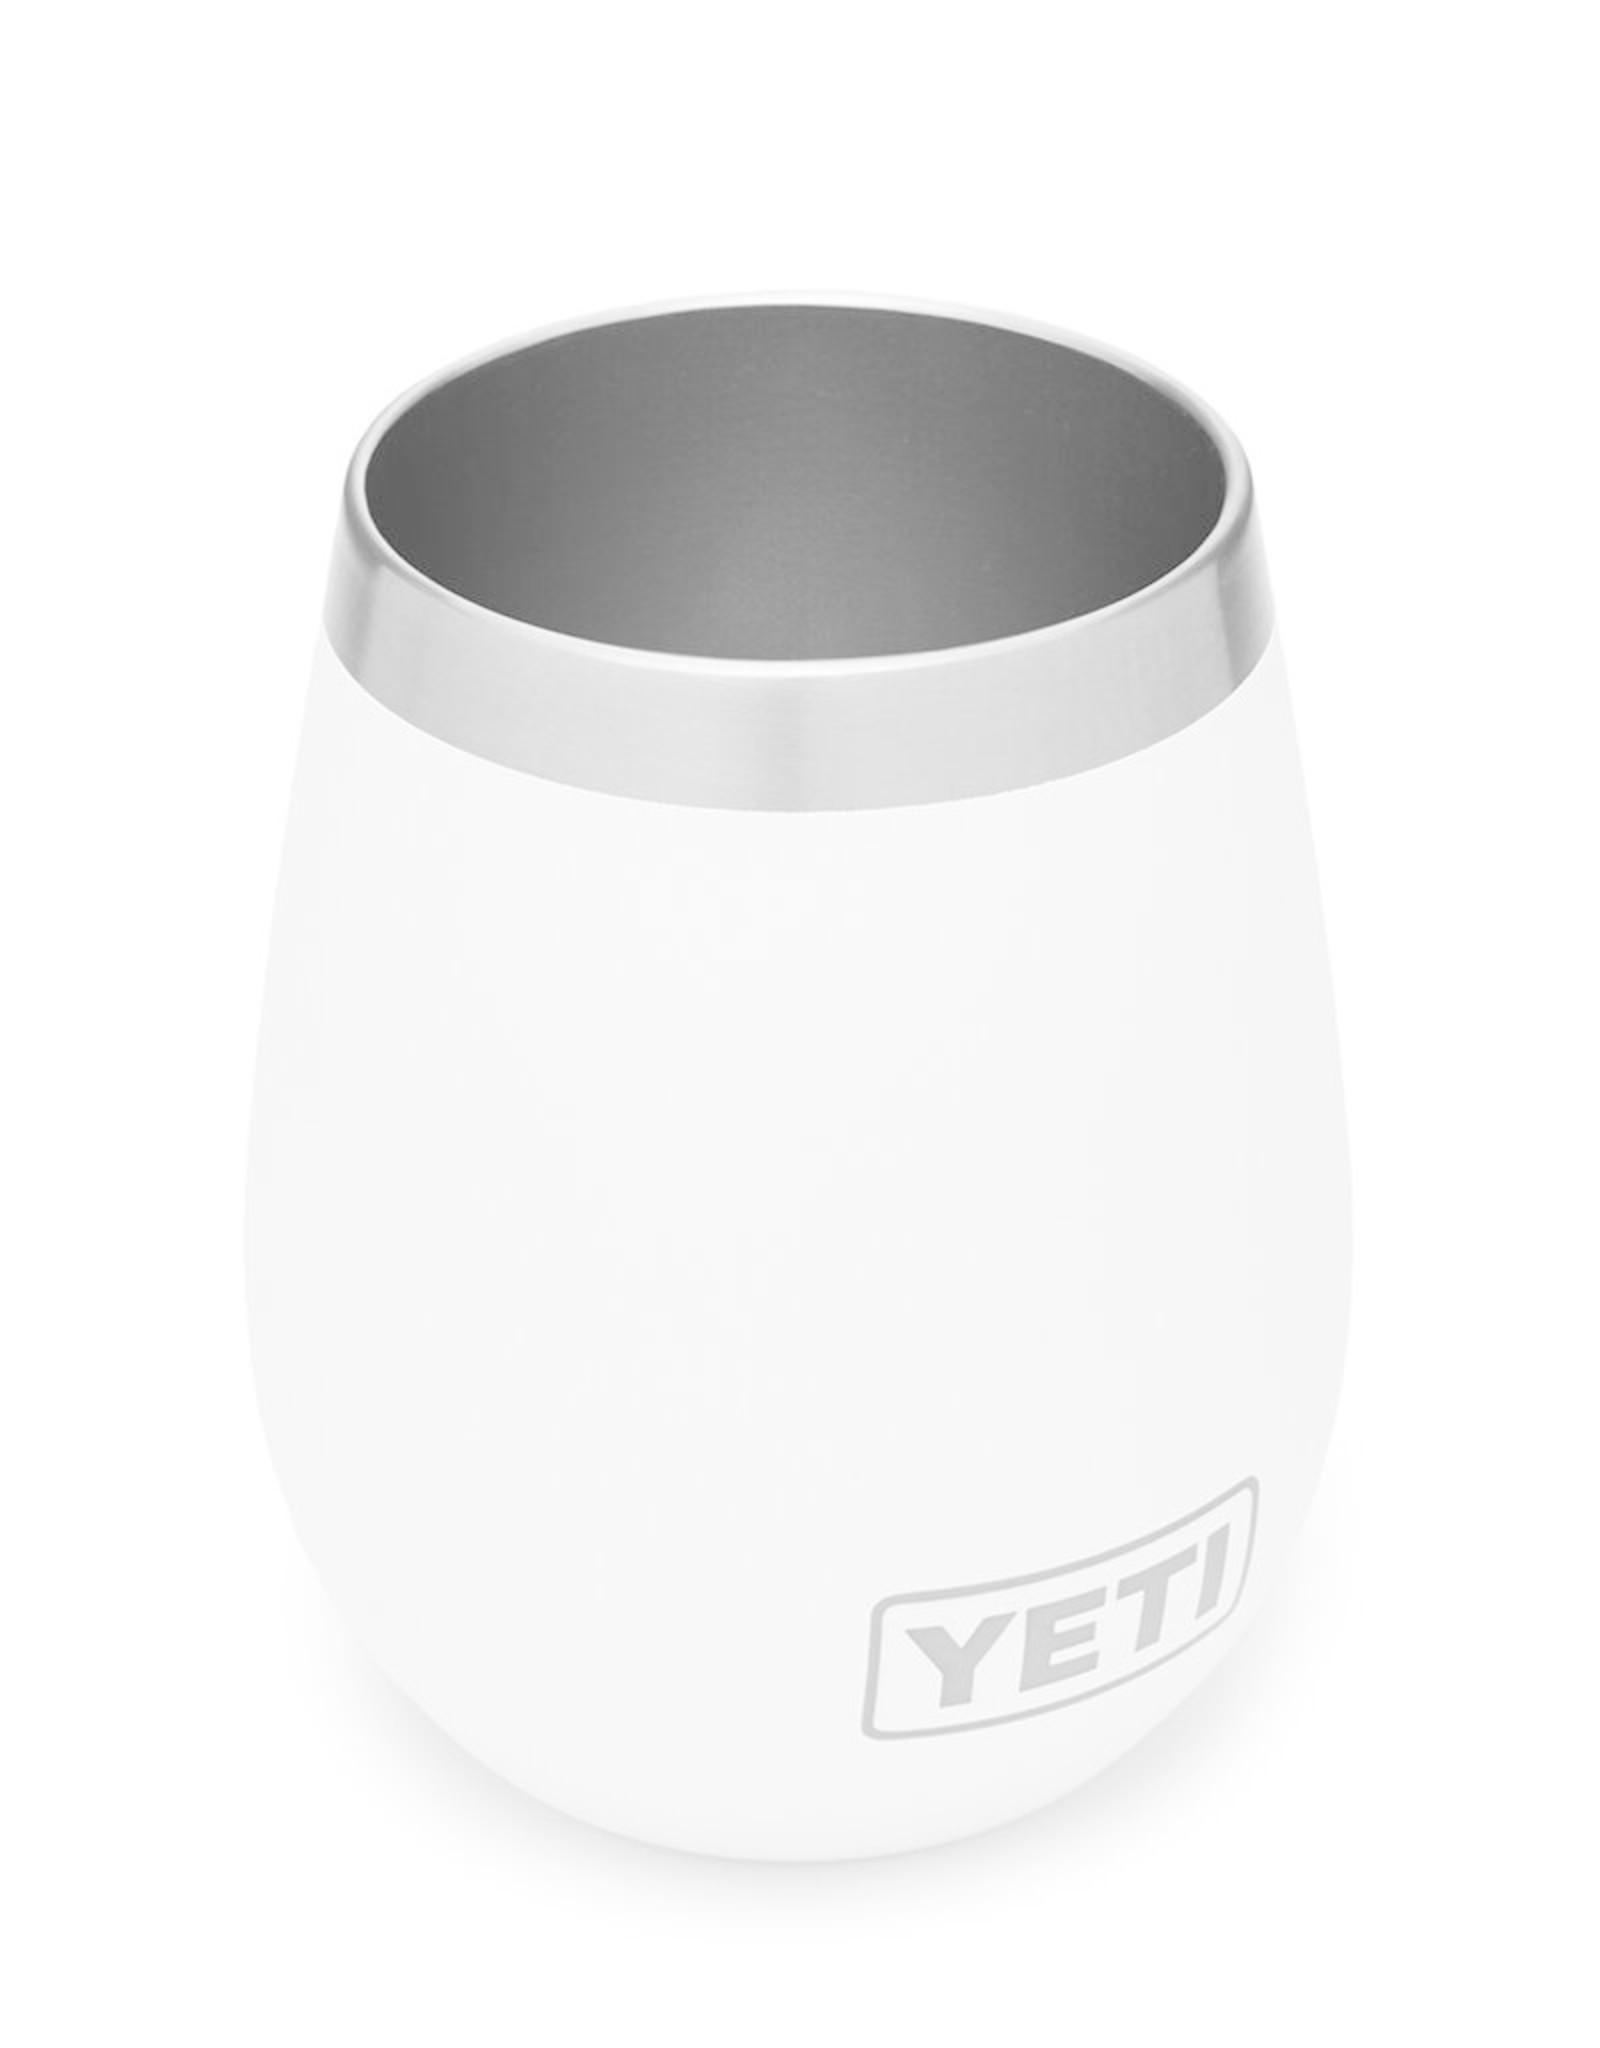 YETI Coolers Rambler 10 oz Wine 2 Pack White